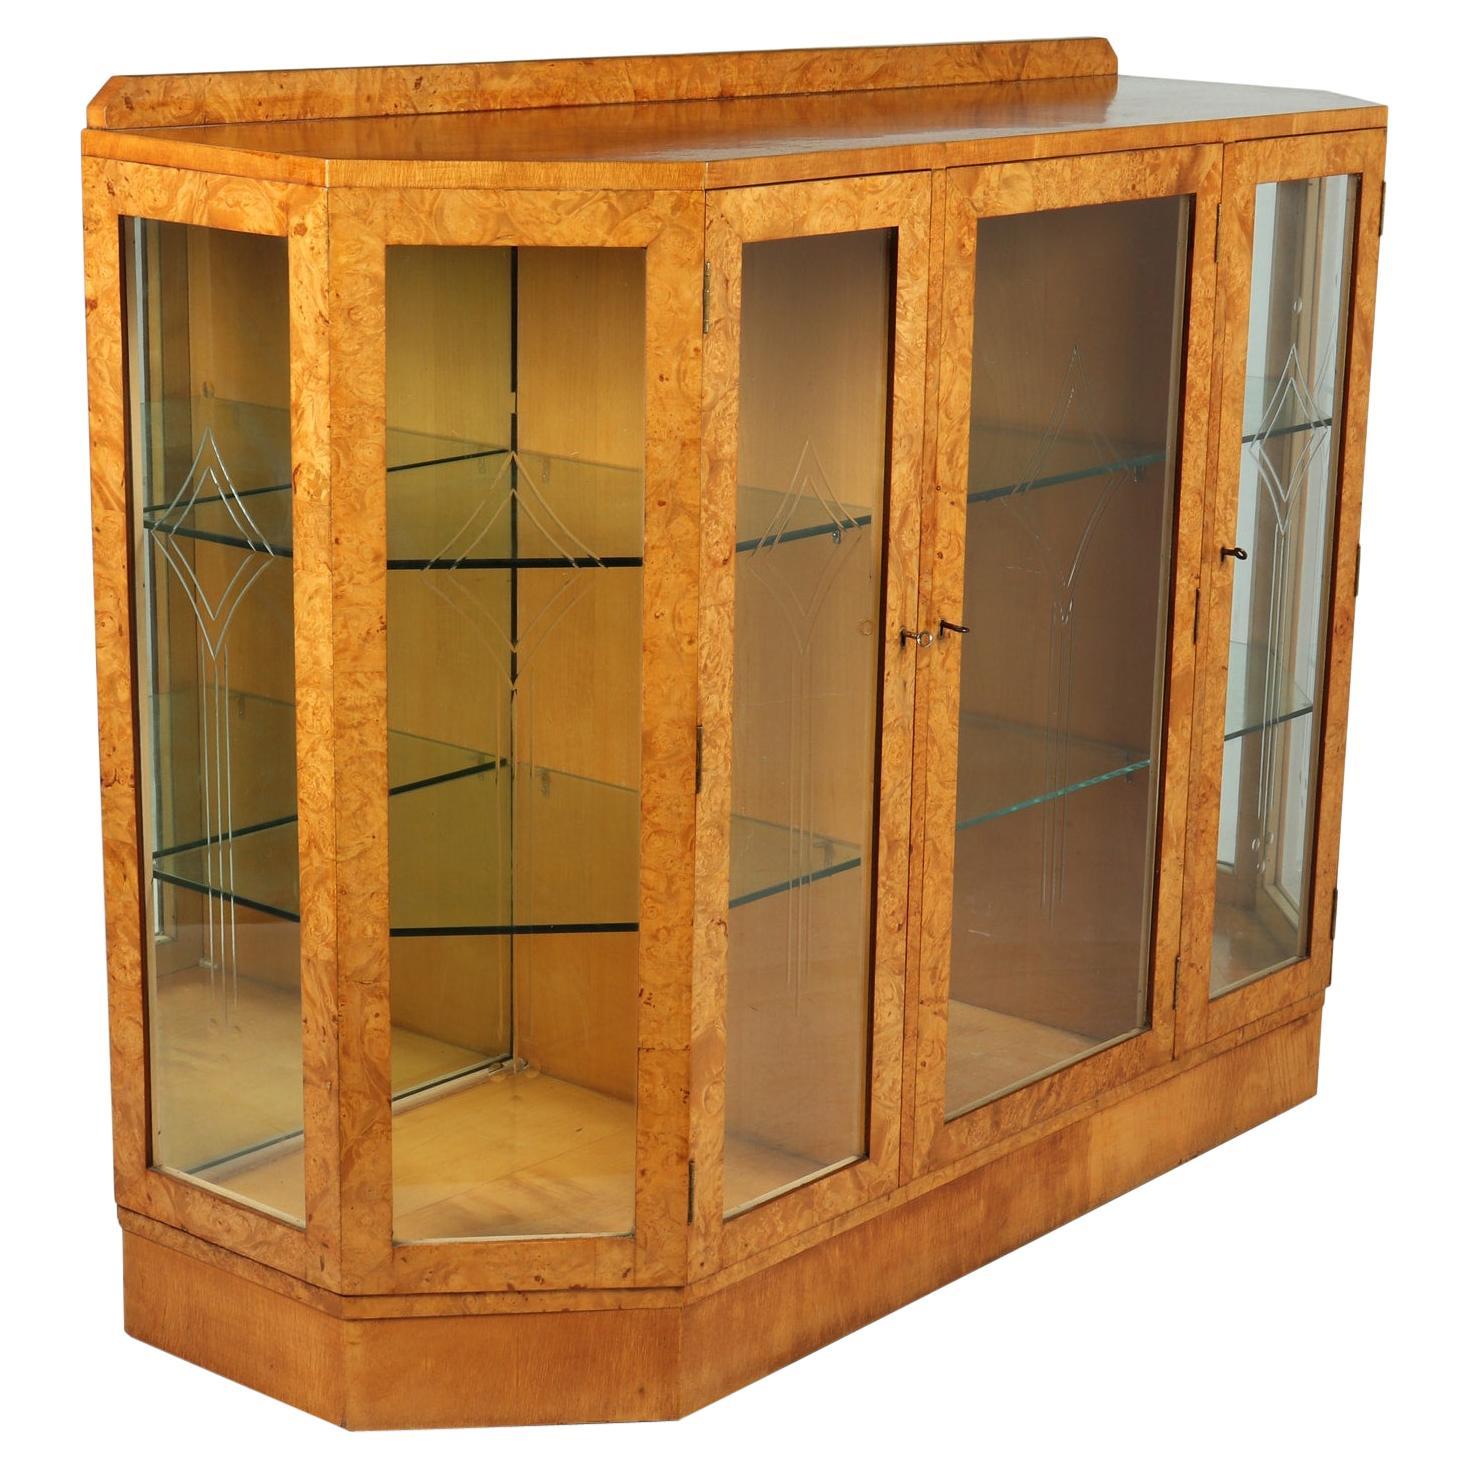 Art Deco Display Cabinet in Burr Maple, c1930